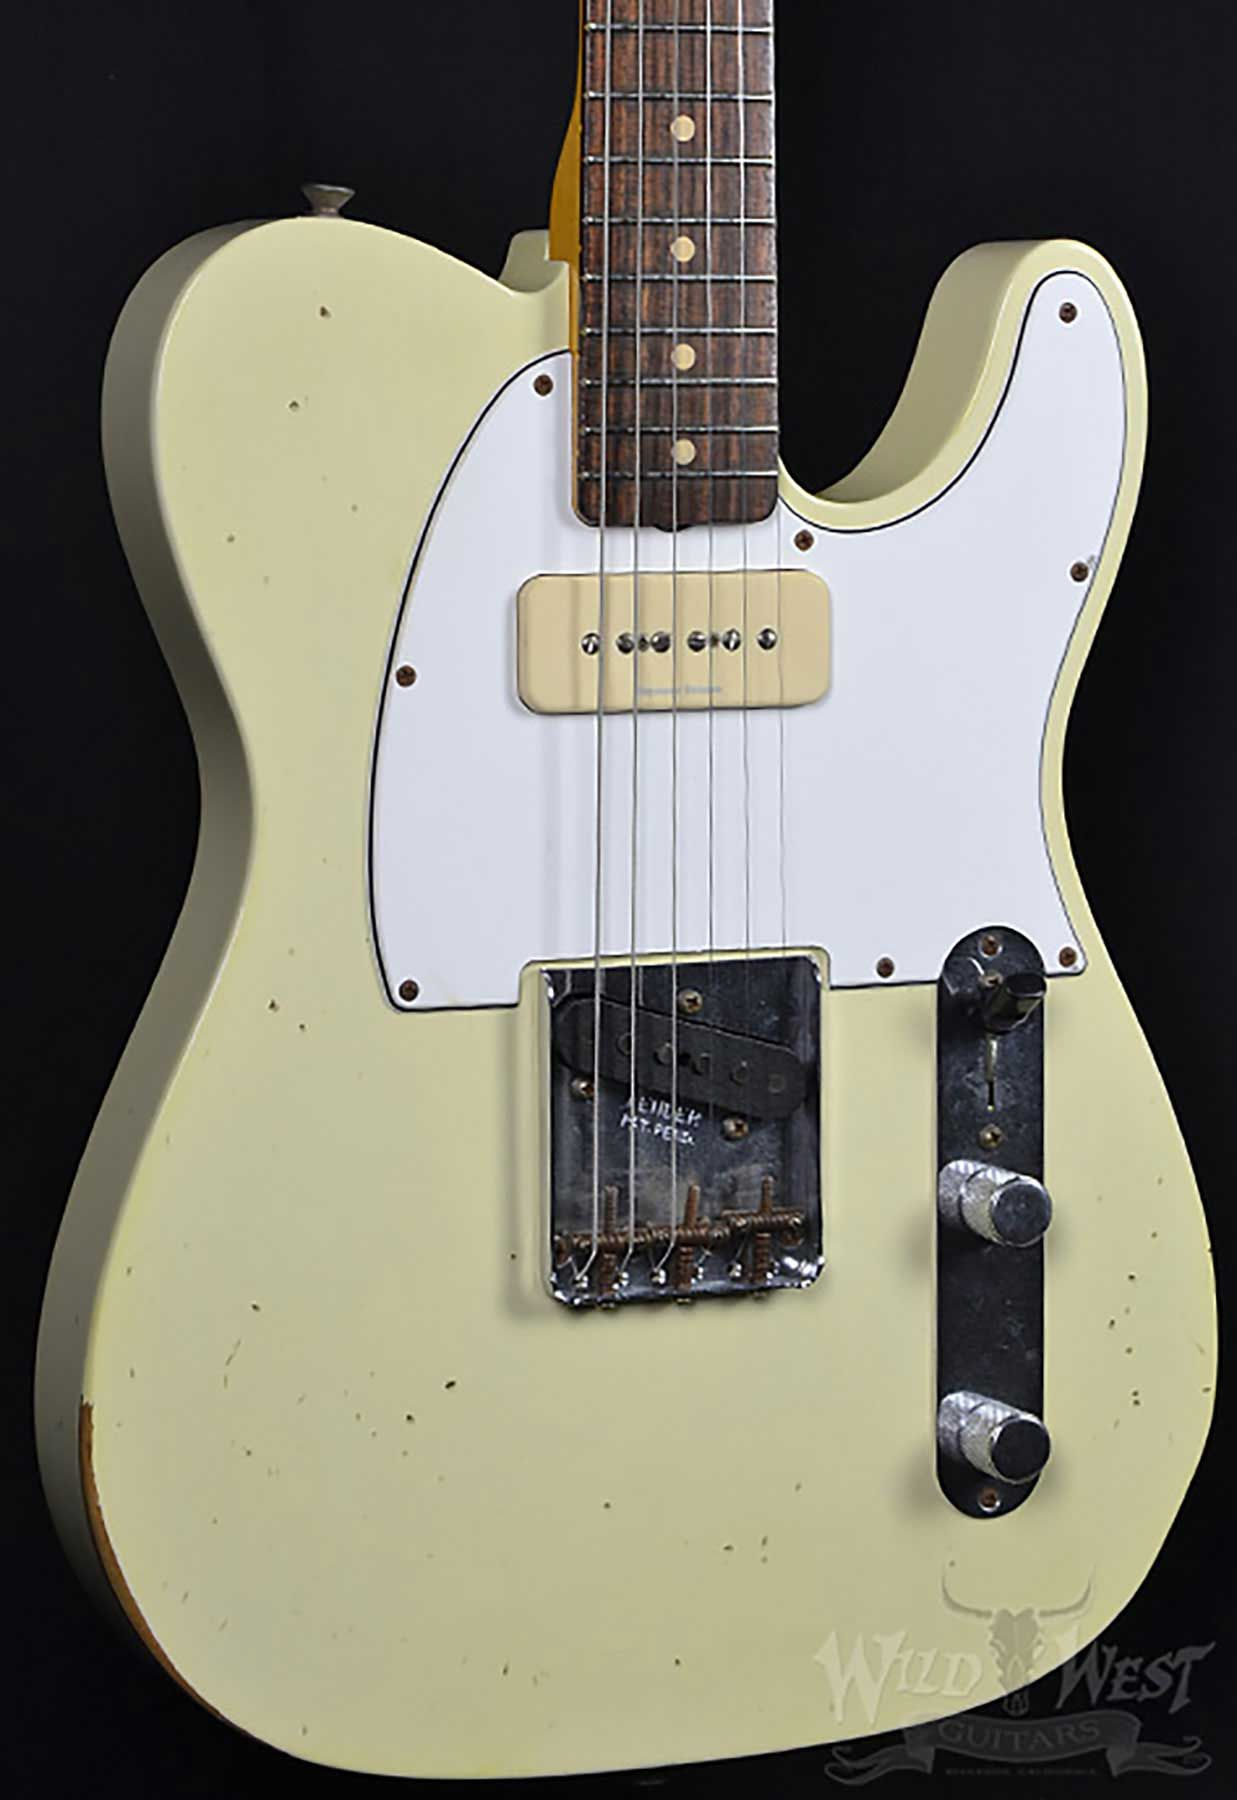 medium resolution of fender 1963 p90 telecaster relic faded vintage white guitar wiring 1963 fender telecaster wiring diagram